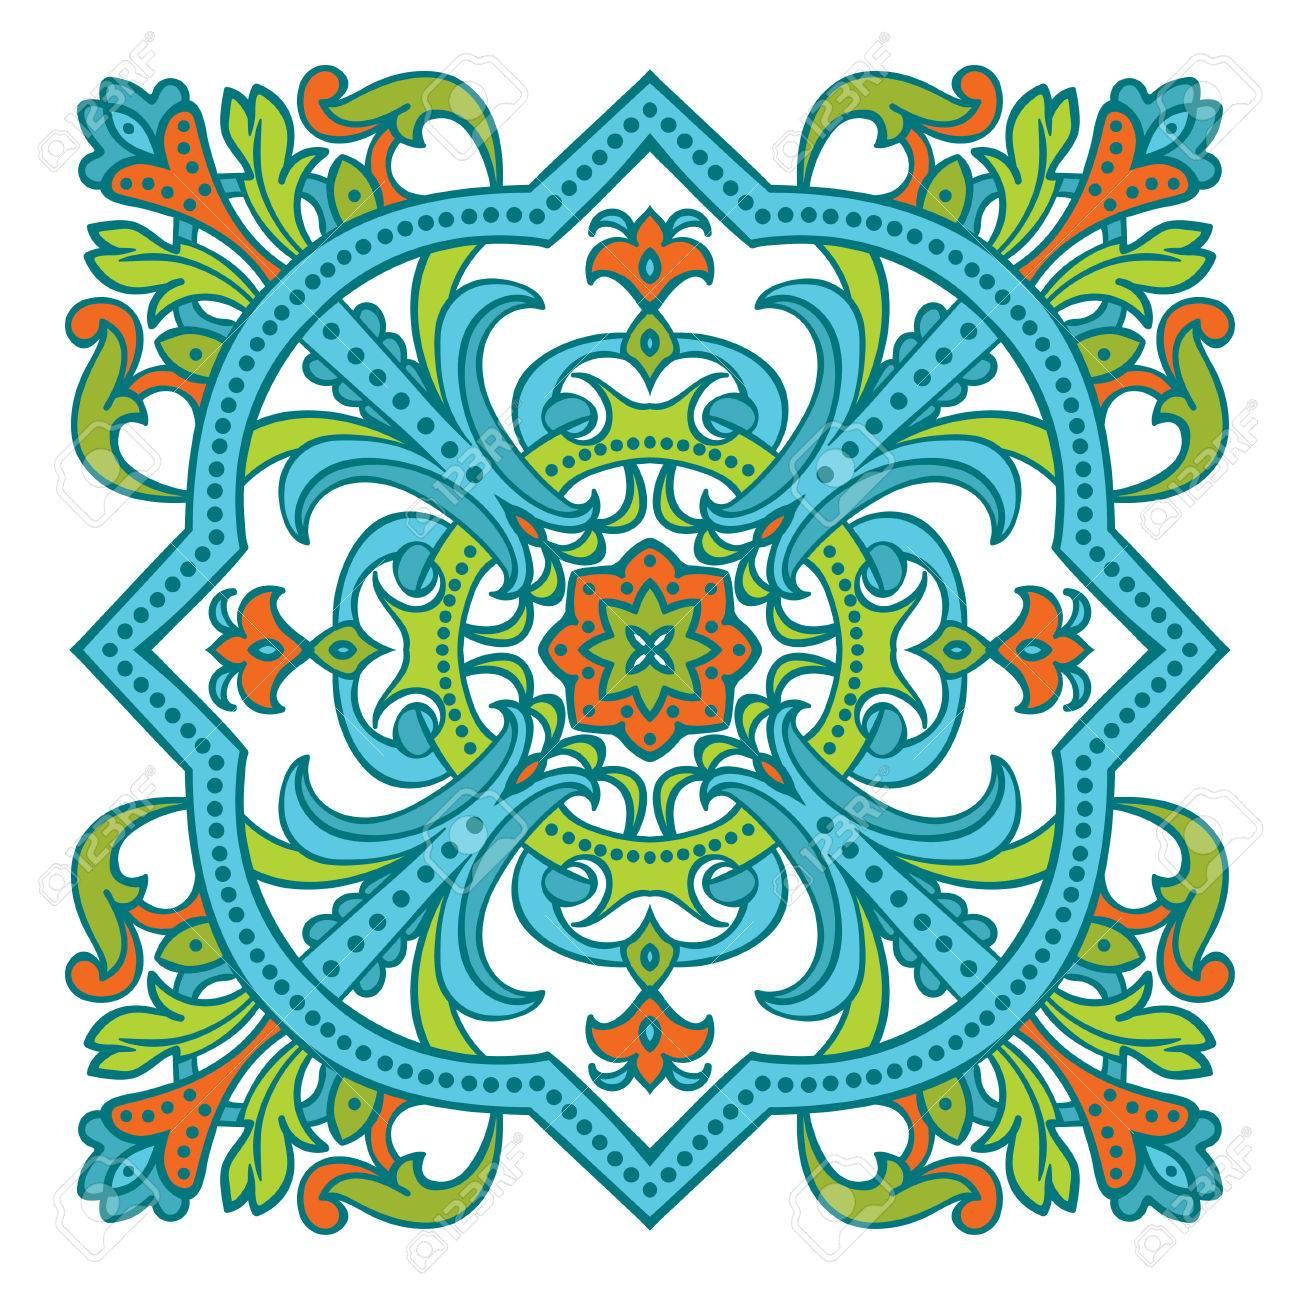 1300x1300 Hand Drawing Zentangle Color Element. Italian Majolica Style